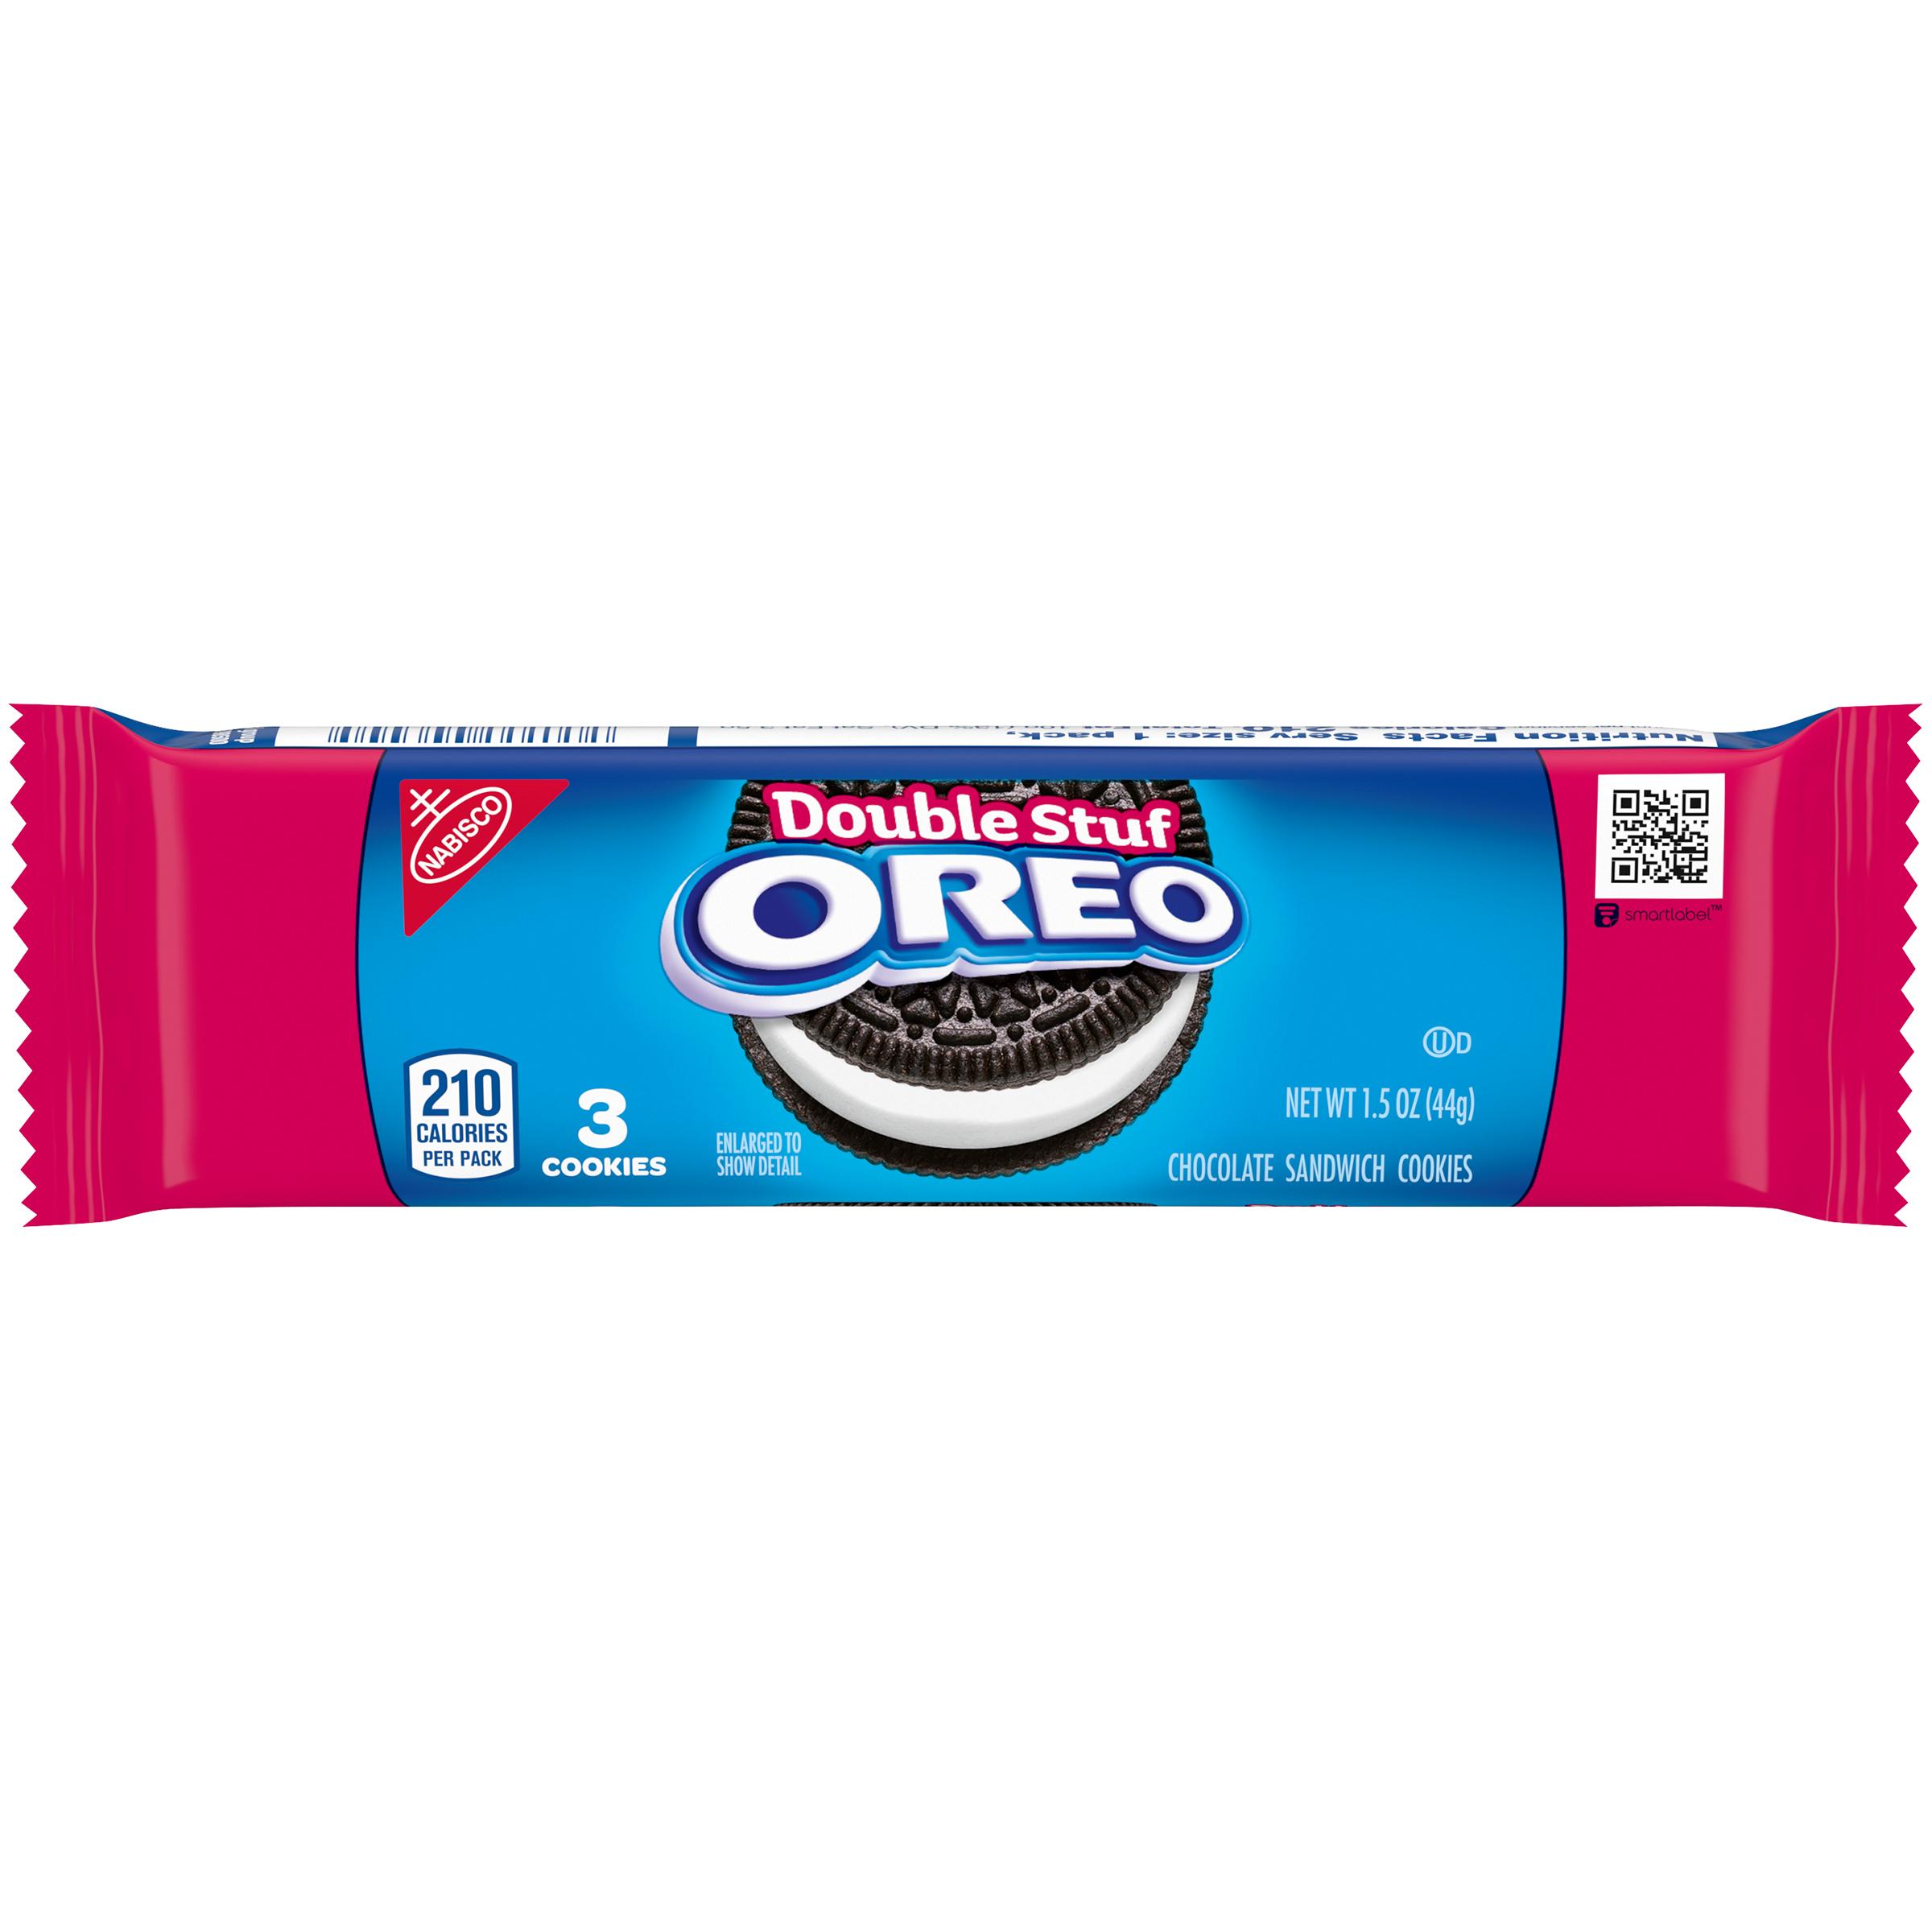 OREO Double Stuf Cookies 1.5 oz